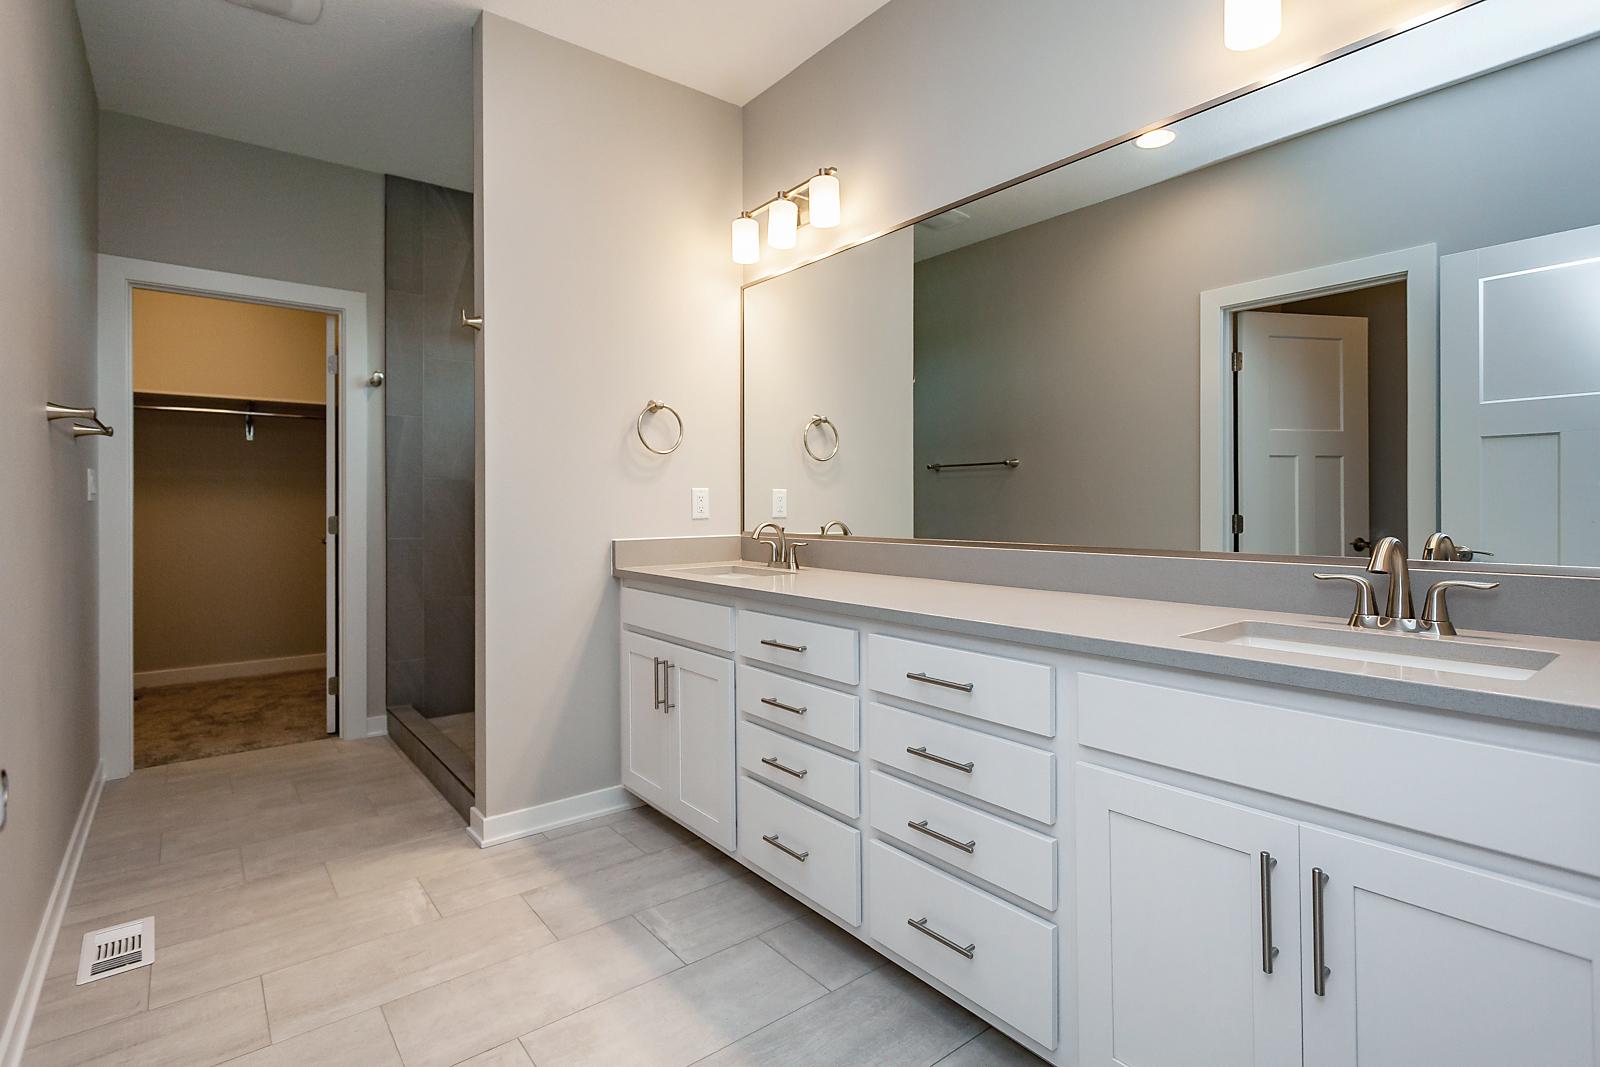 Master Bathroom with Gray Quartz